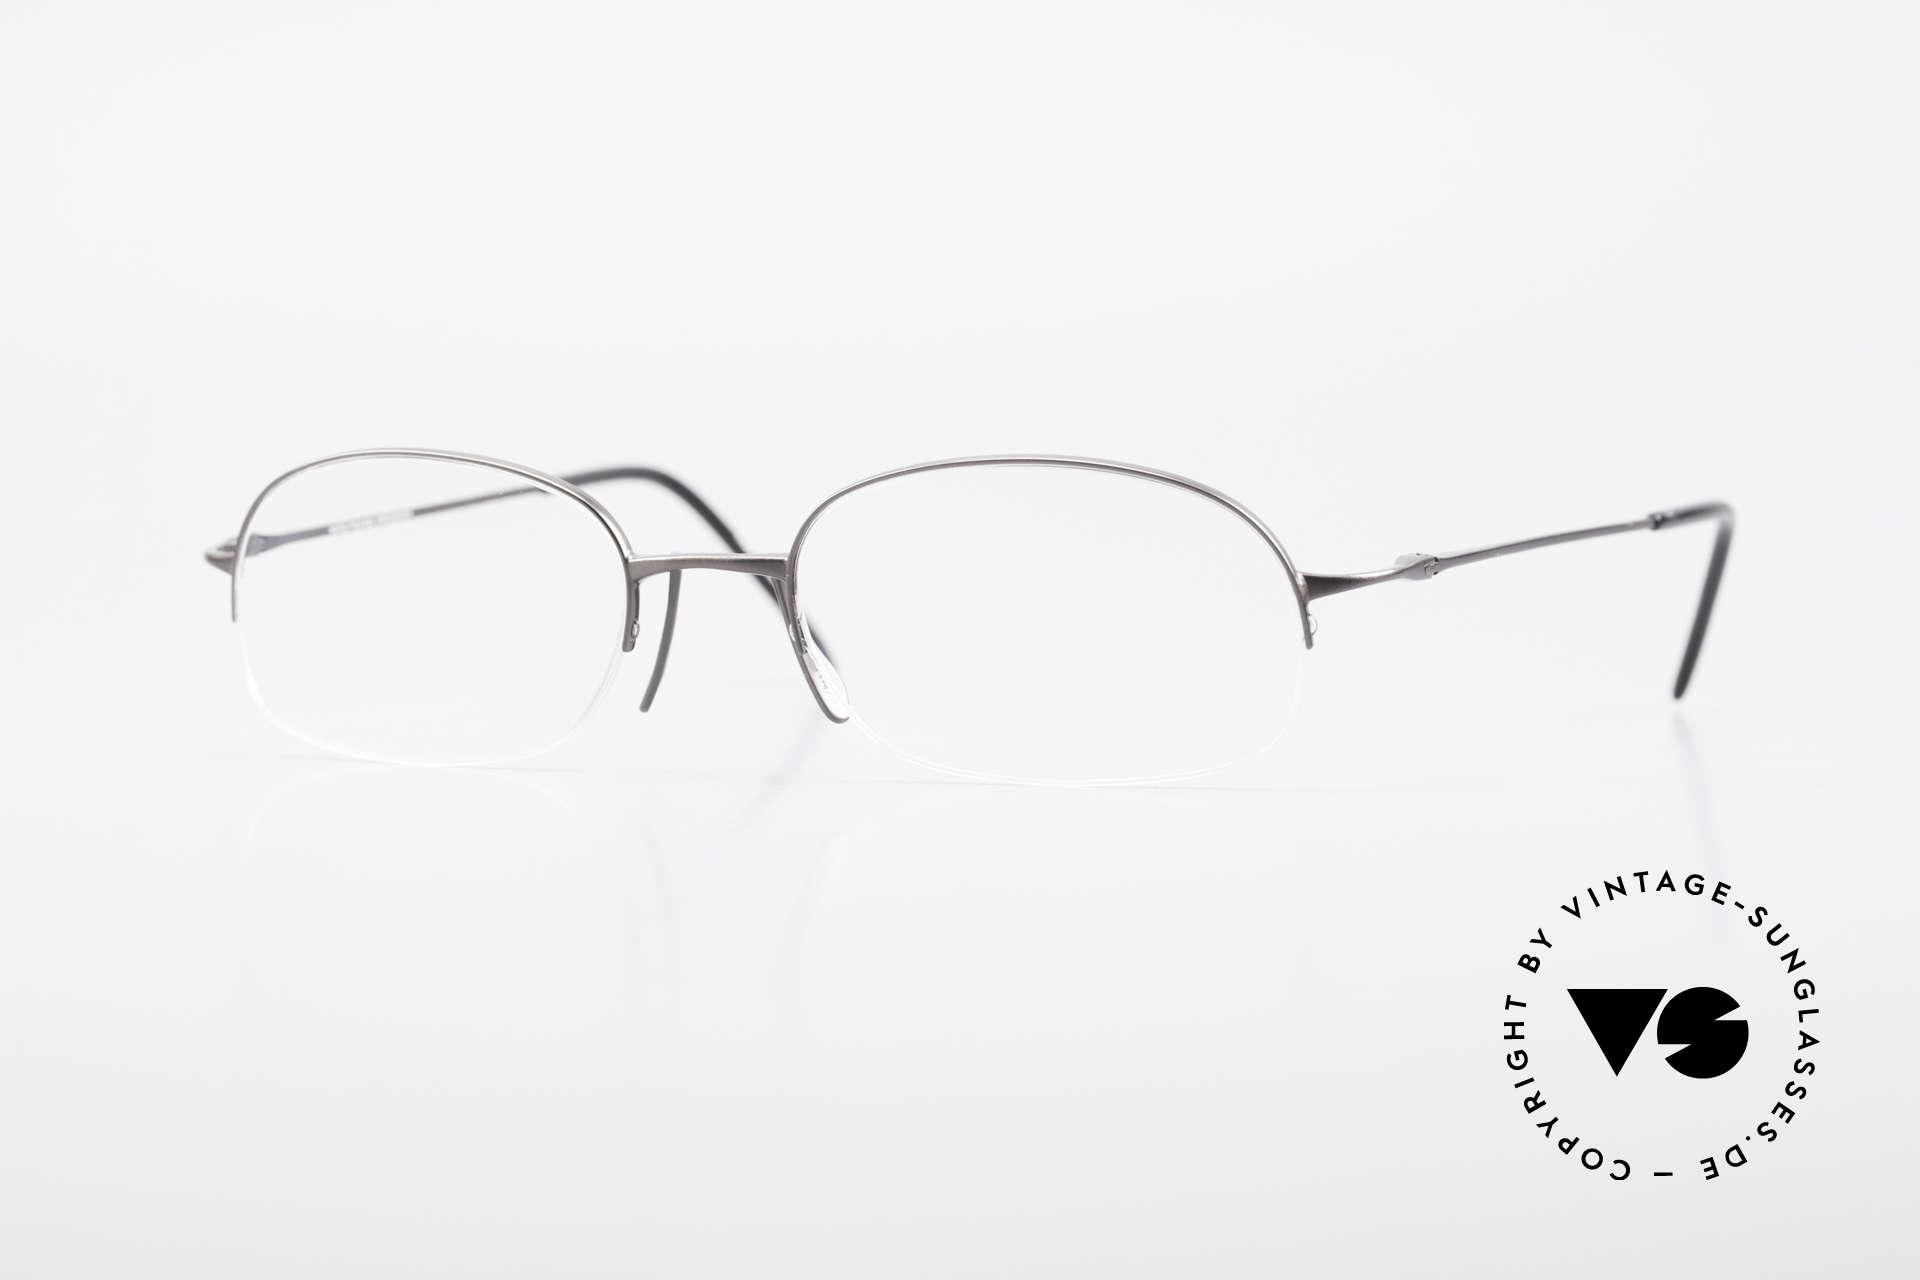 Wolfgang Proksch WP0007 Semi Rimless Titanium Frame, Wolfgang Proksch VINTAGE eyeglasses from 1999, Made for Men